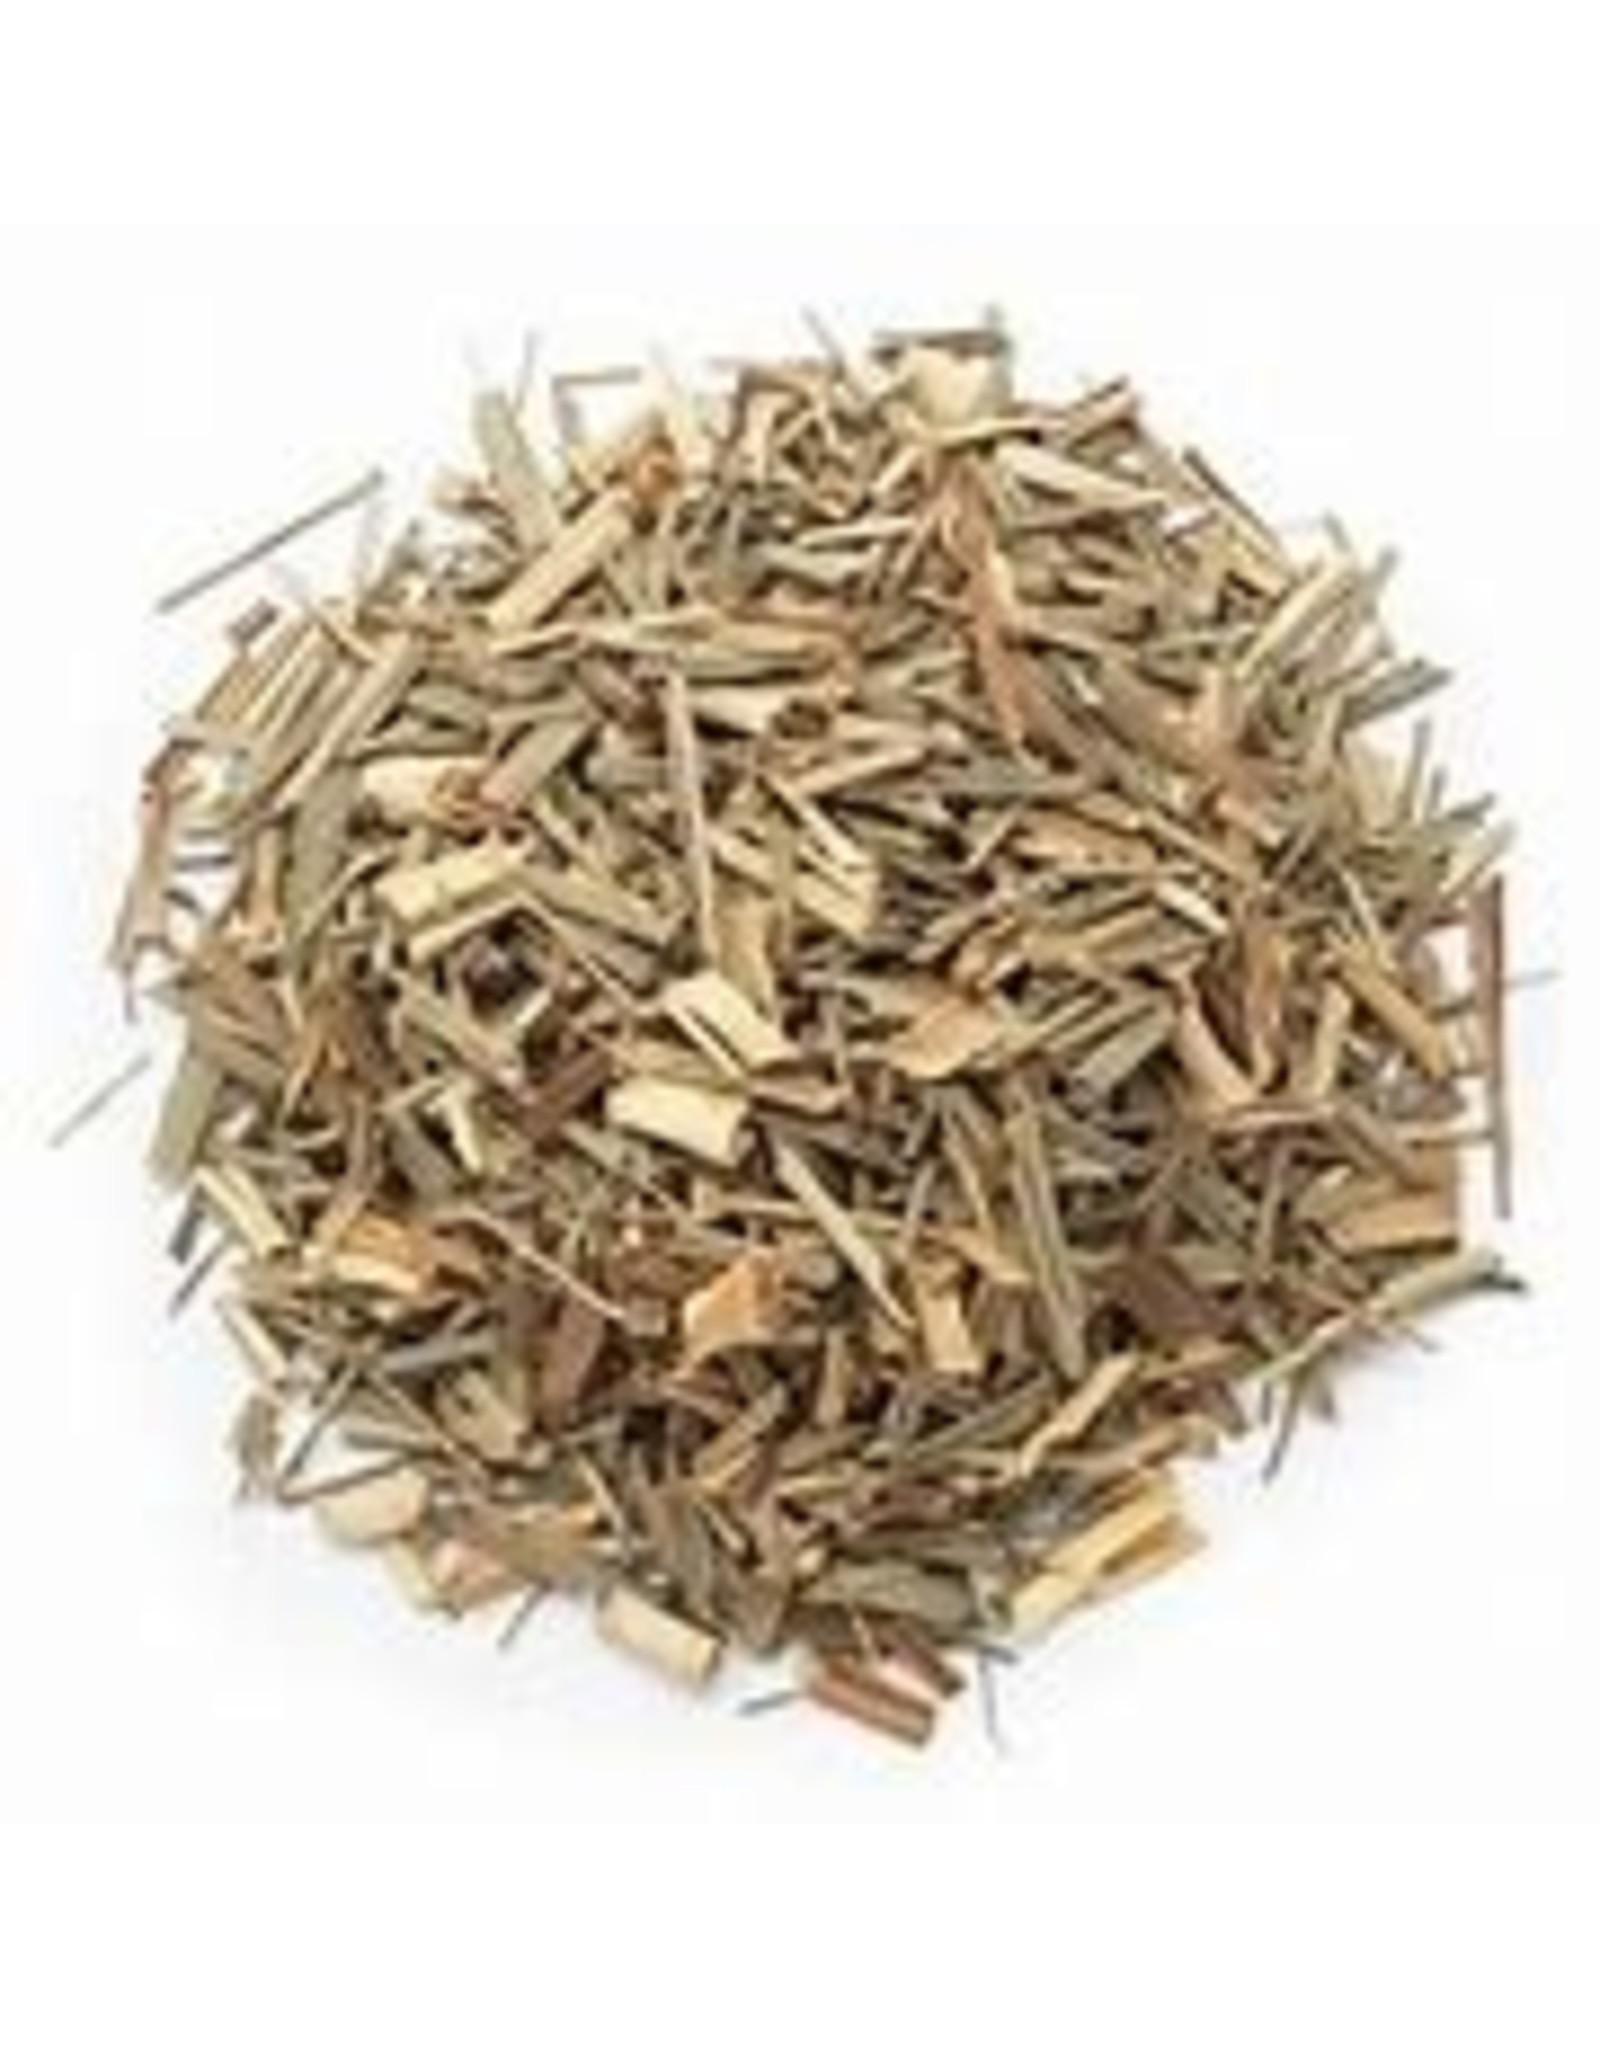 Lemongrass herb 1 oz